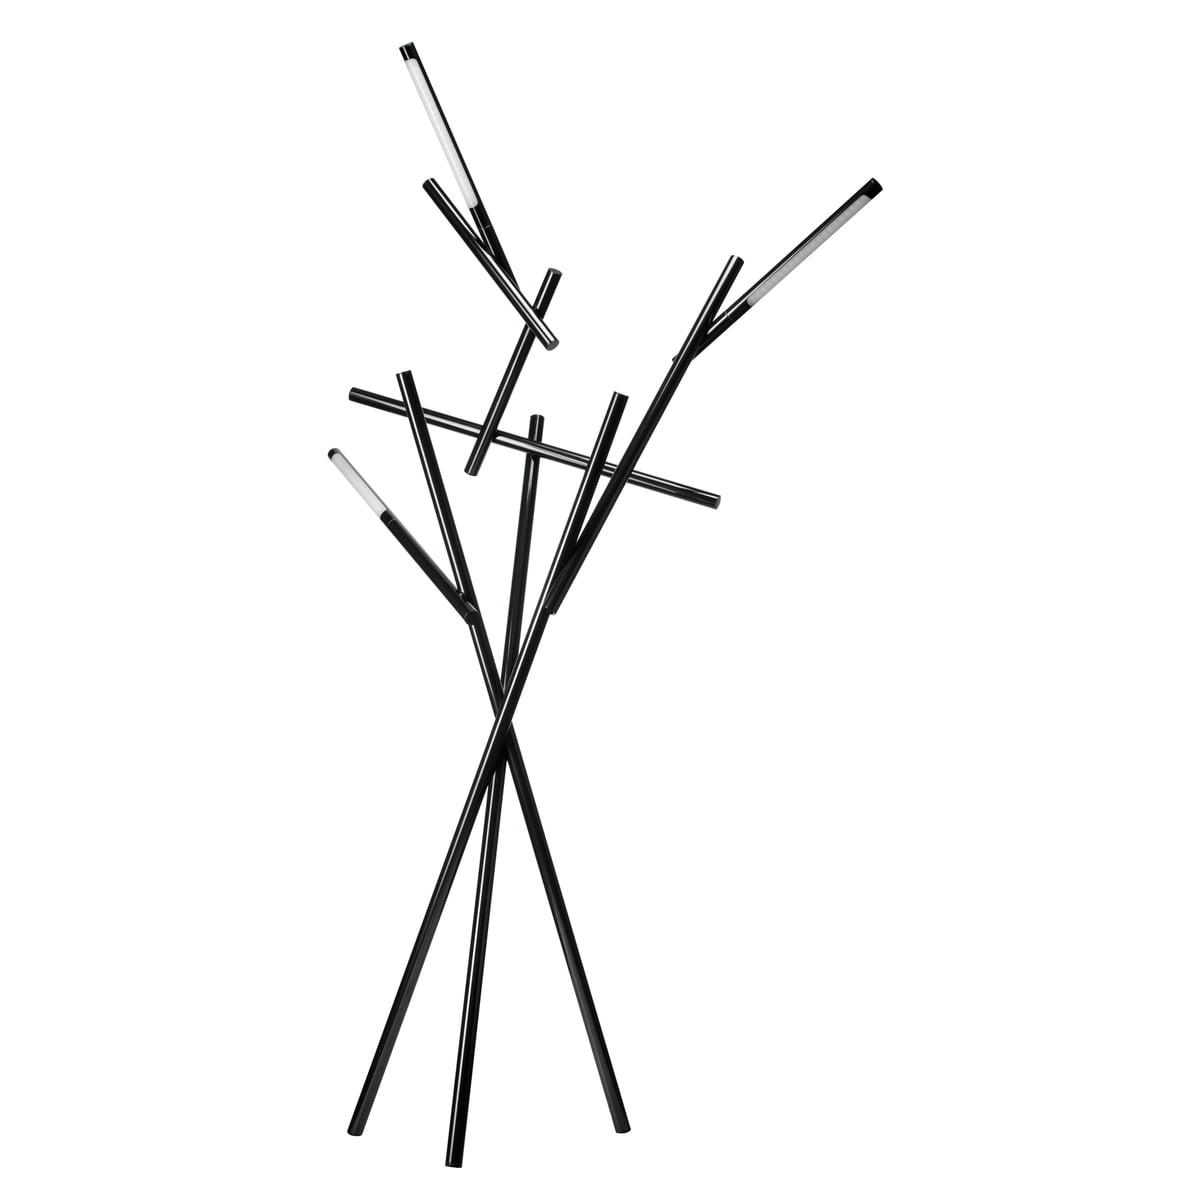 Stehleuchte tuareg von foscarini bei connox foscarini tuareg stehleuchte in schwarz parisarafo Choice Image